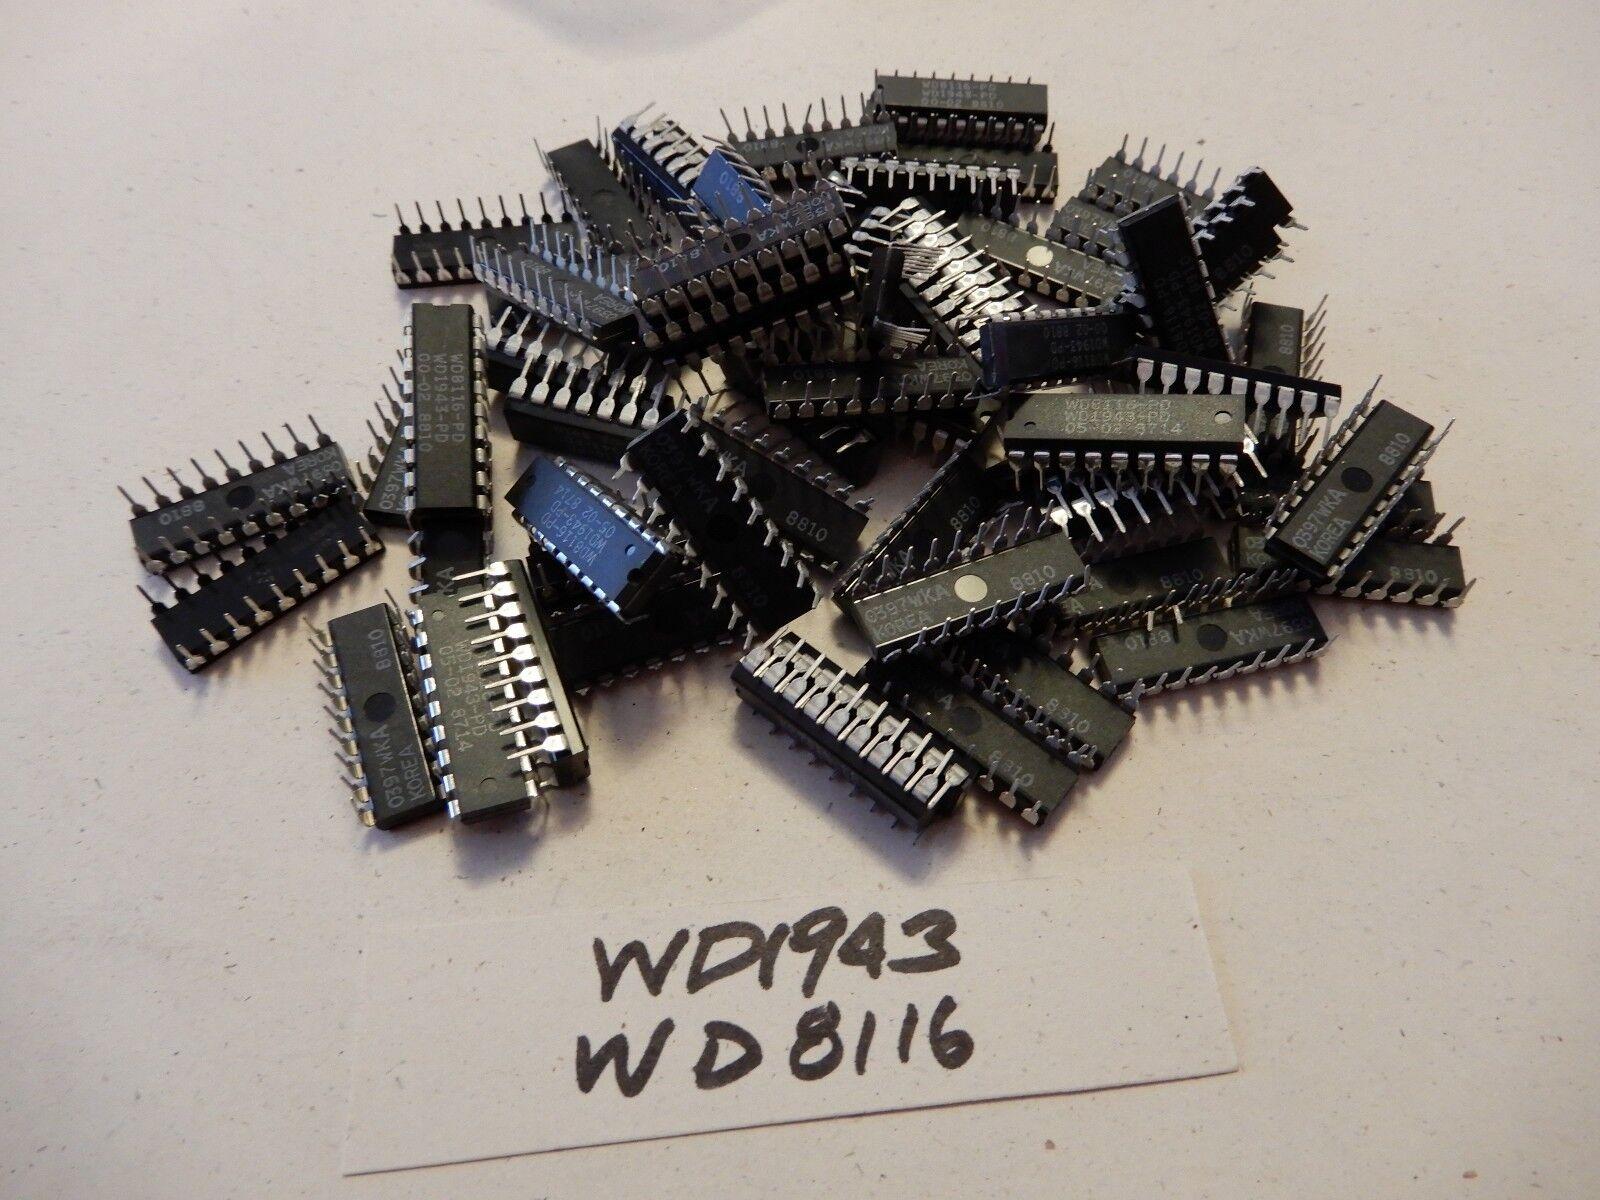 Huge Lot of Western Digital WD1943 WD8116 Dual Baud Clock Rate IC's Qty 30+ BGX